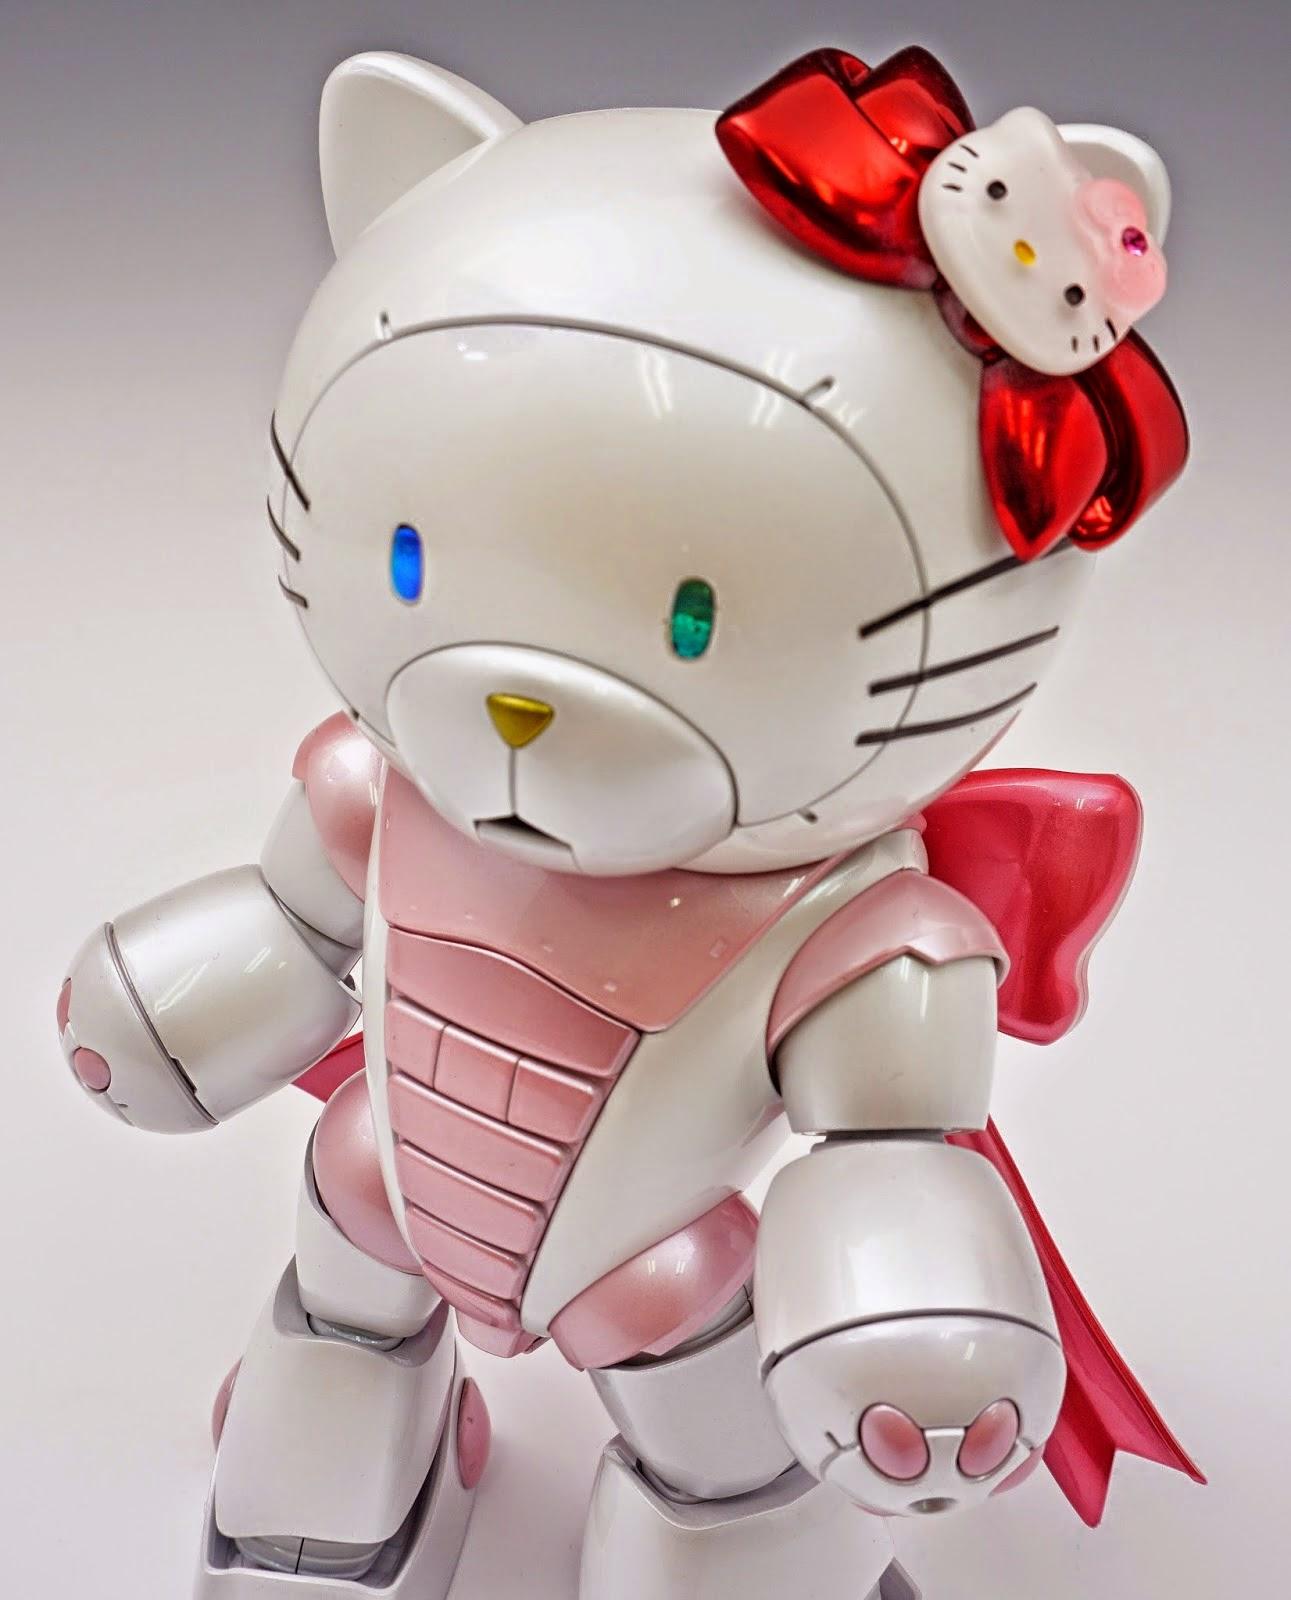 Gundam Family: HGBF 1/144 BearGGuy III [Hello Kitty Ver